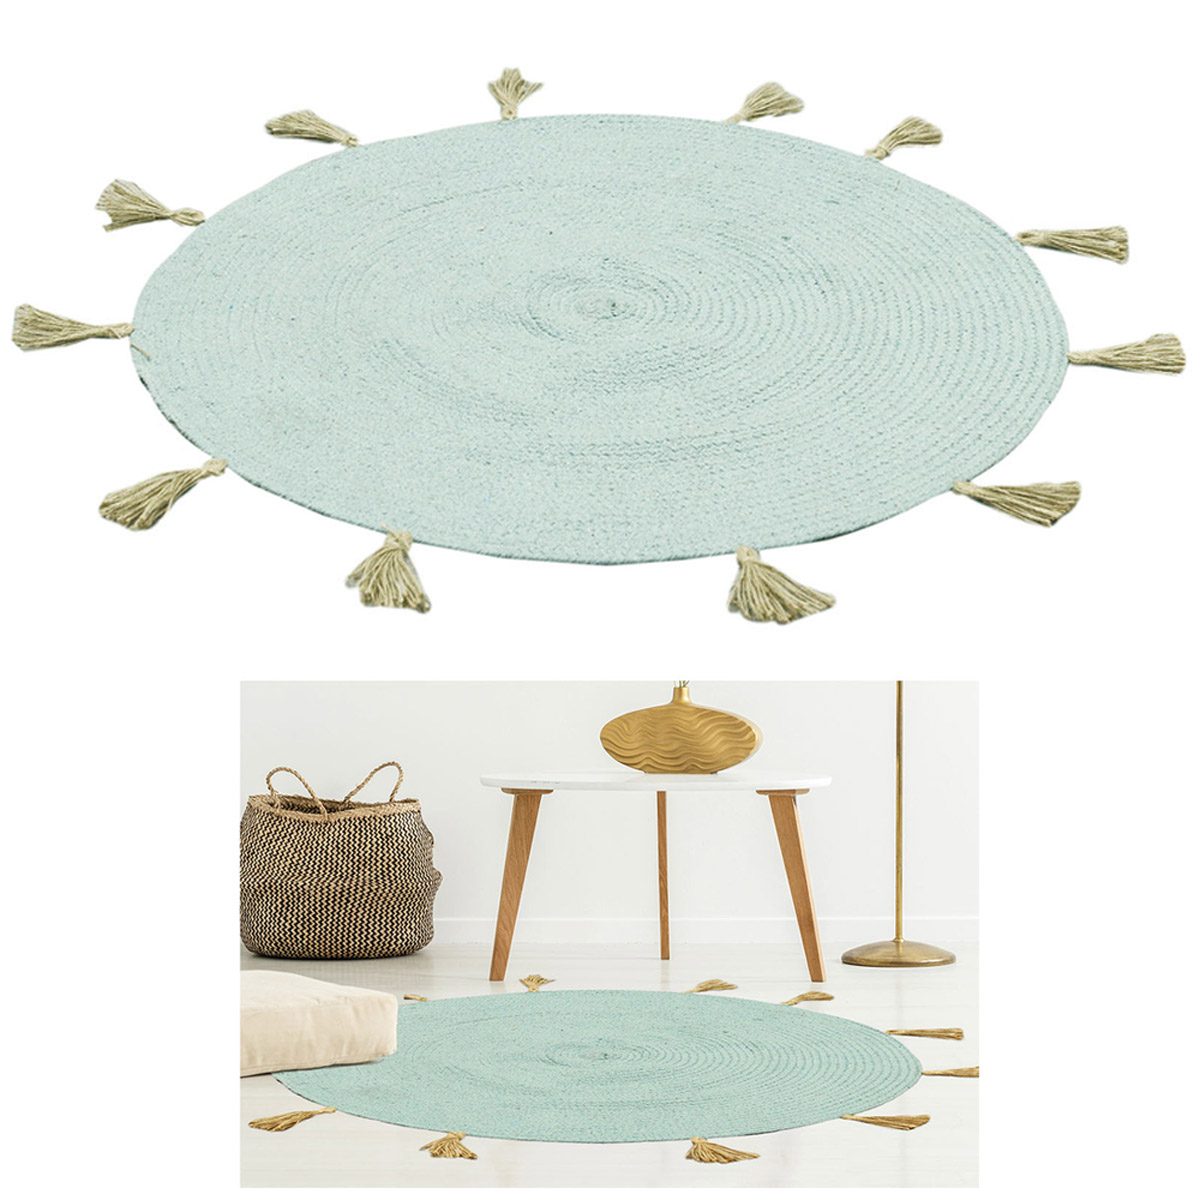 Tapis coton \'Boho\' turquoise - 90 cm - [R2495]